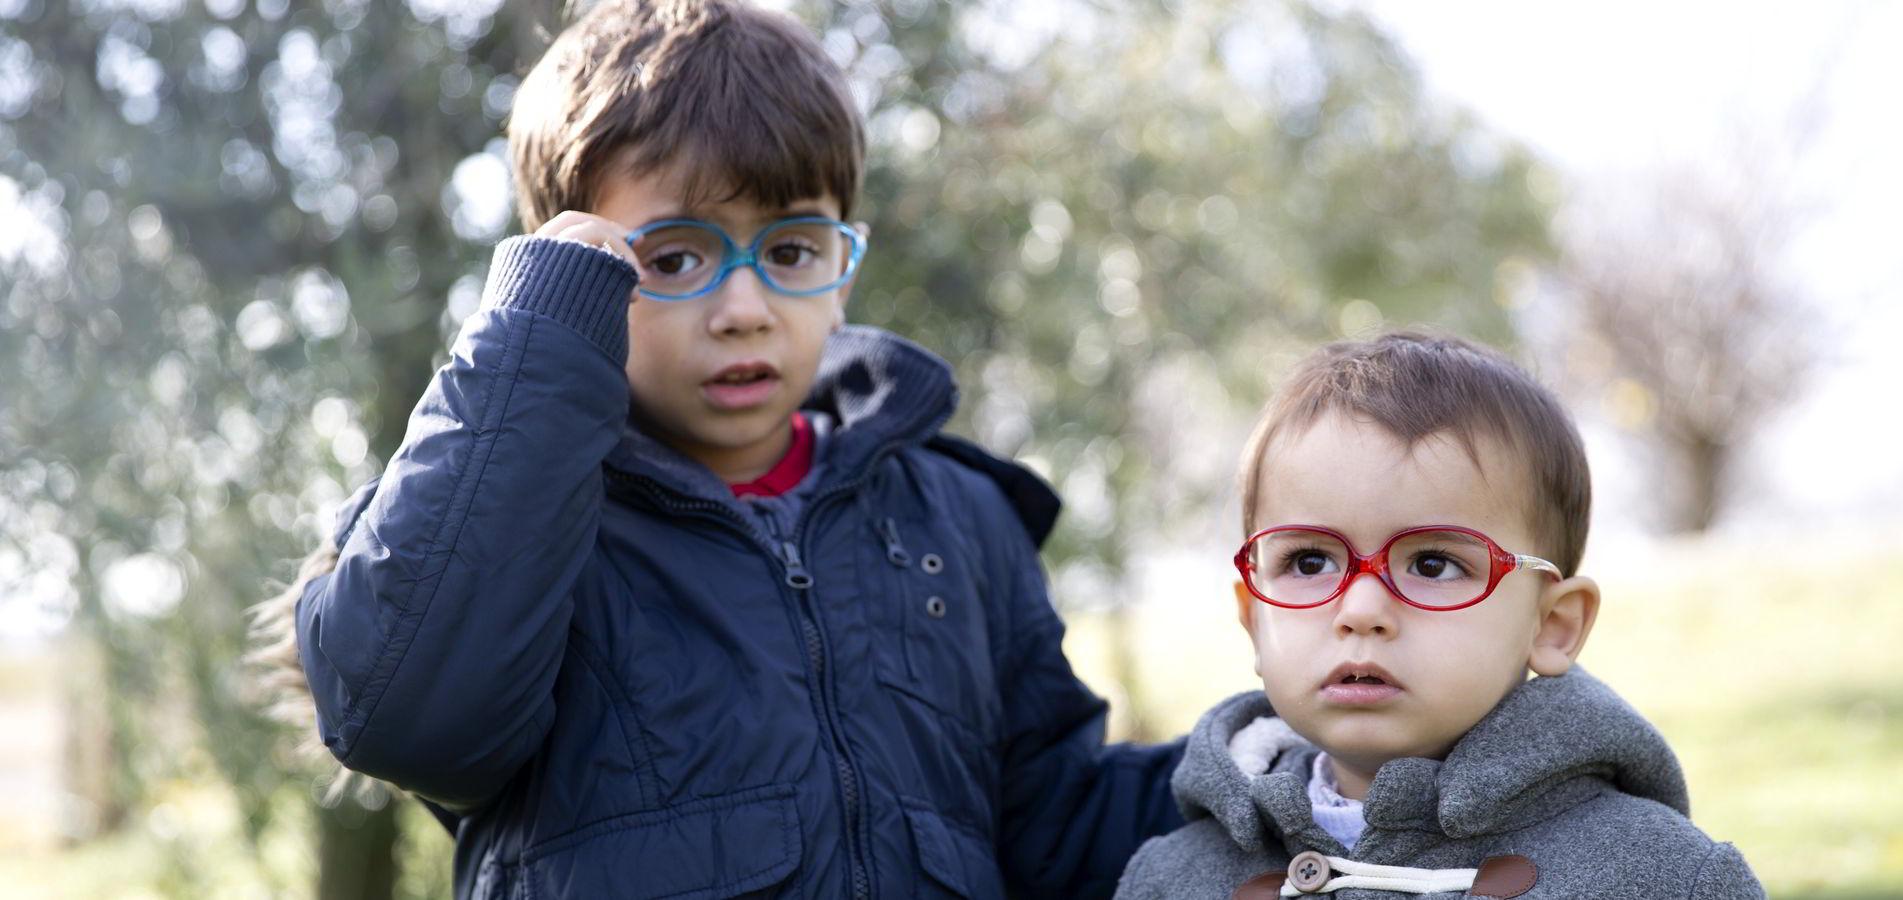 Gafas para niños de diferentes edades